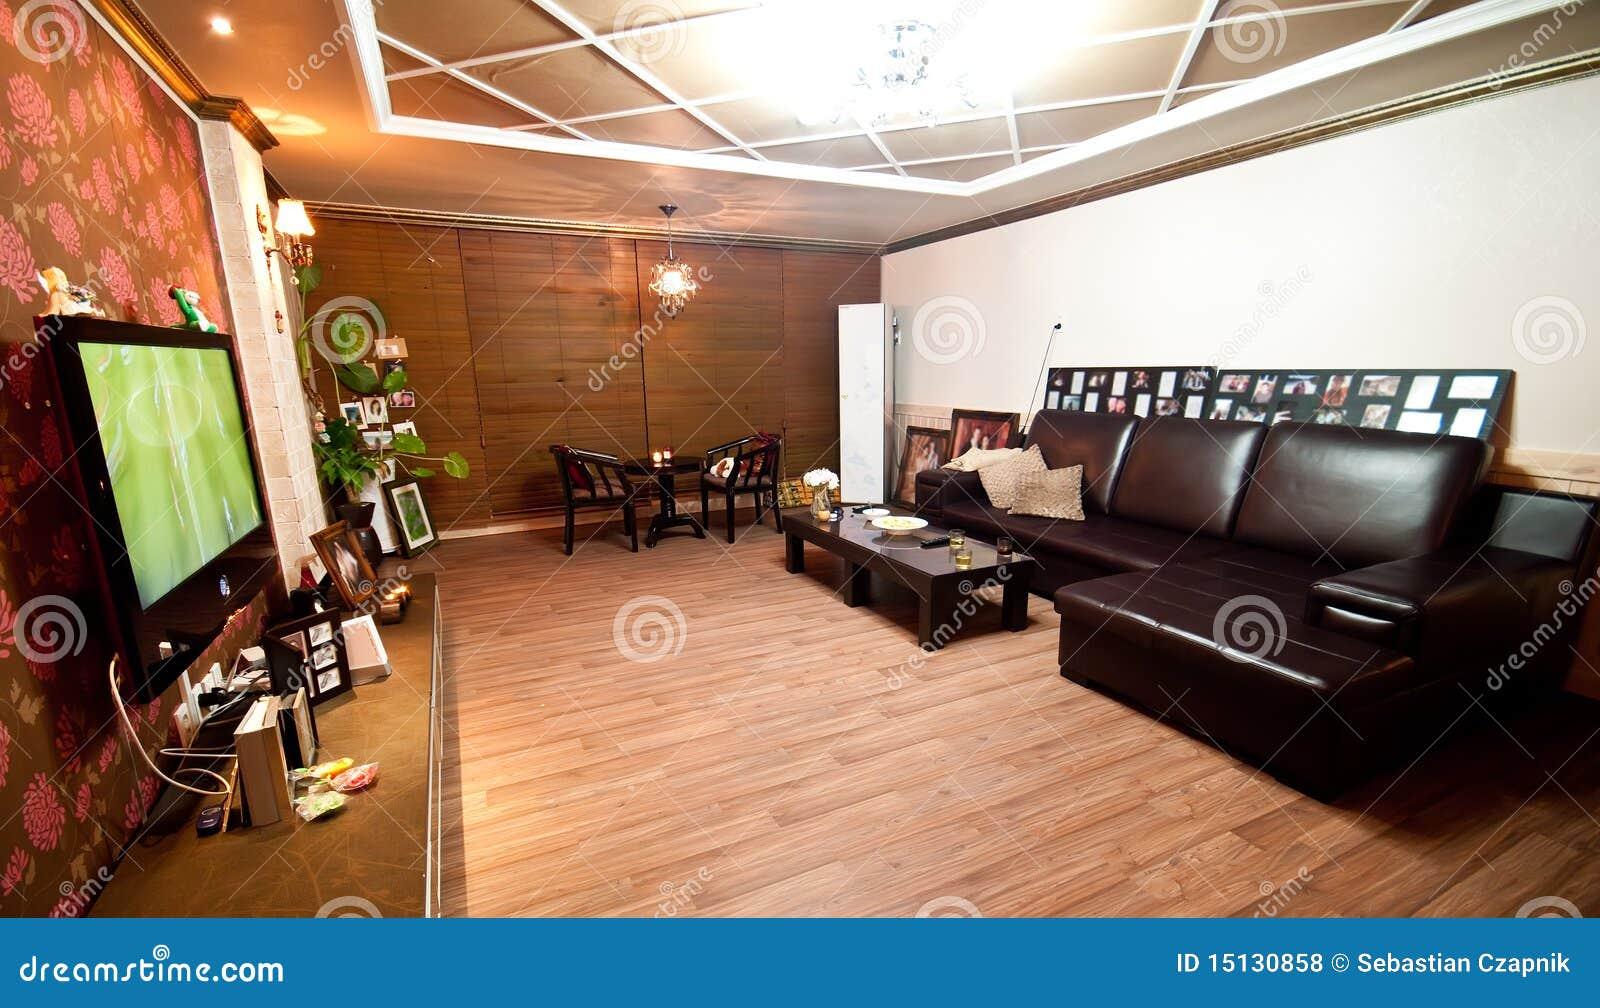 Living room in south korea royalty free stock photos for Modern korean living room